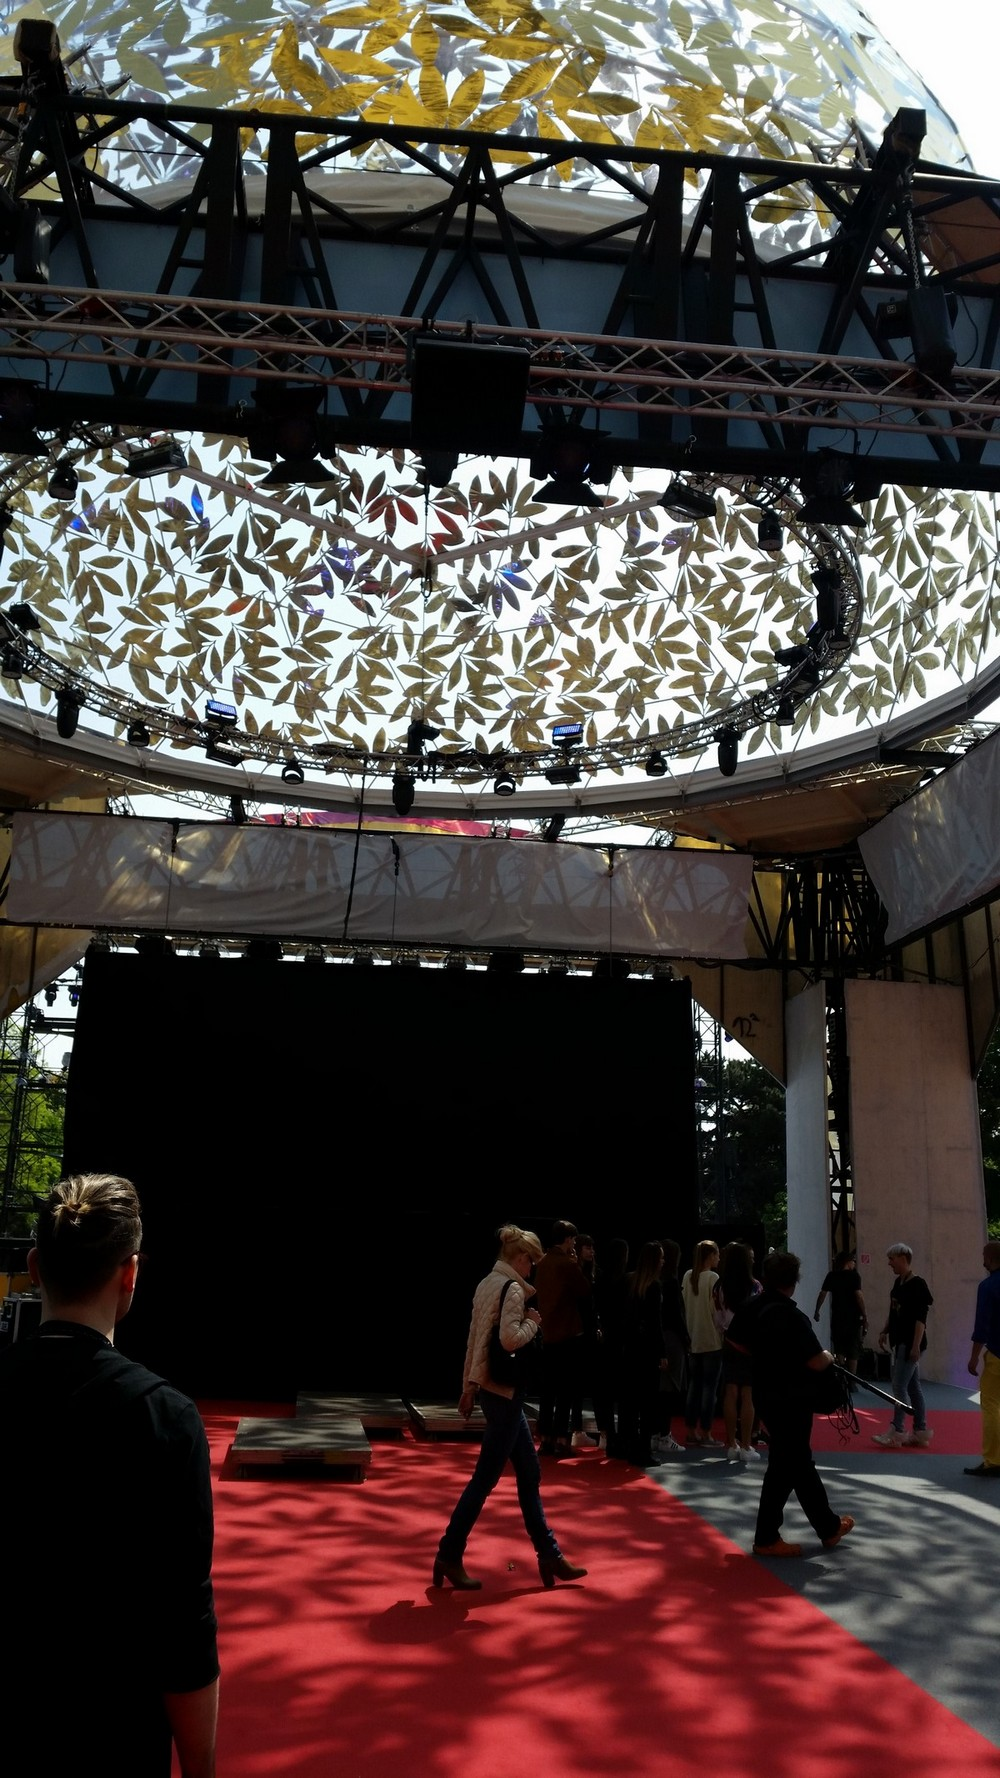 Lauros Dailidenienes prekes zenklo 'Daili' pristatymas Austrijoje Vienoje (10)